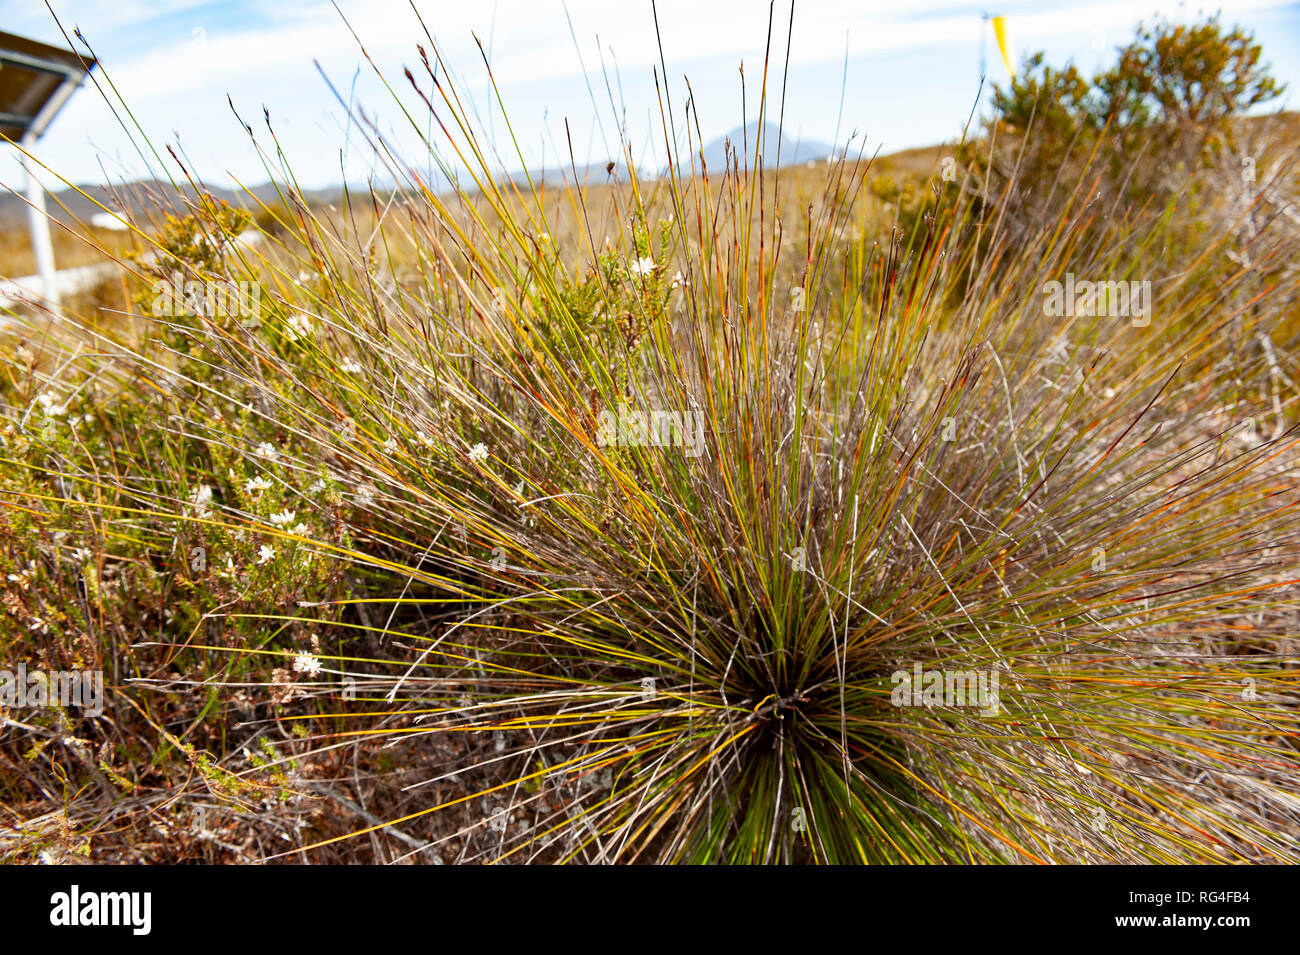 Vegetation, South West Tasmania, Australia Stock Photo